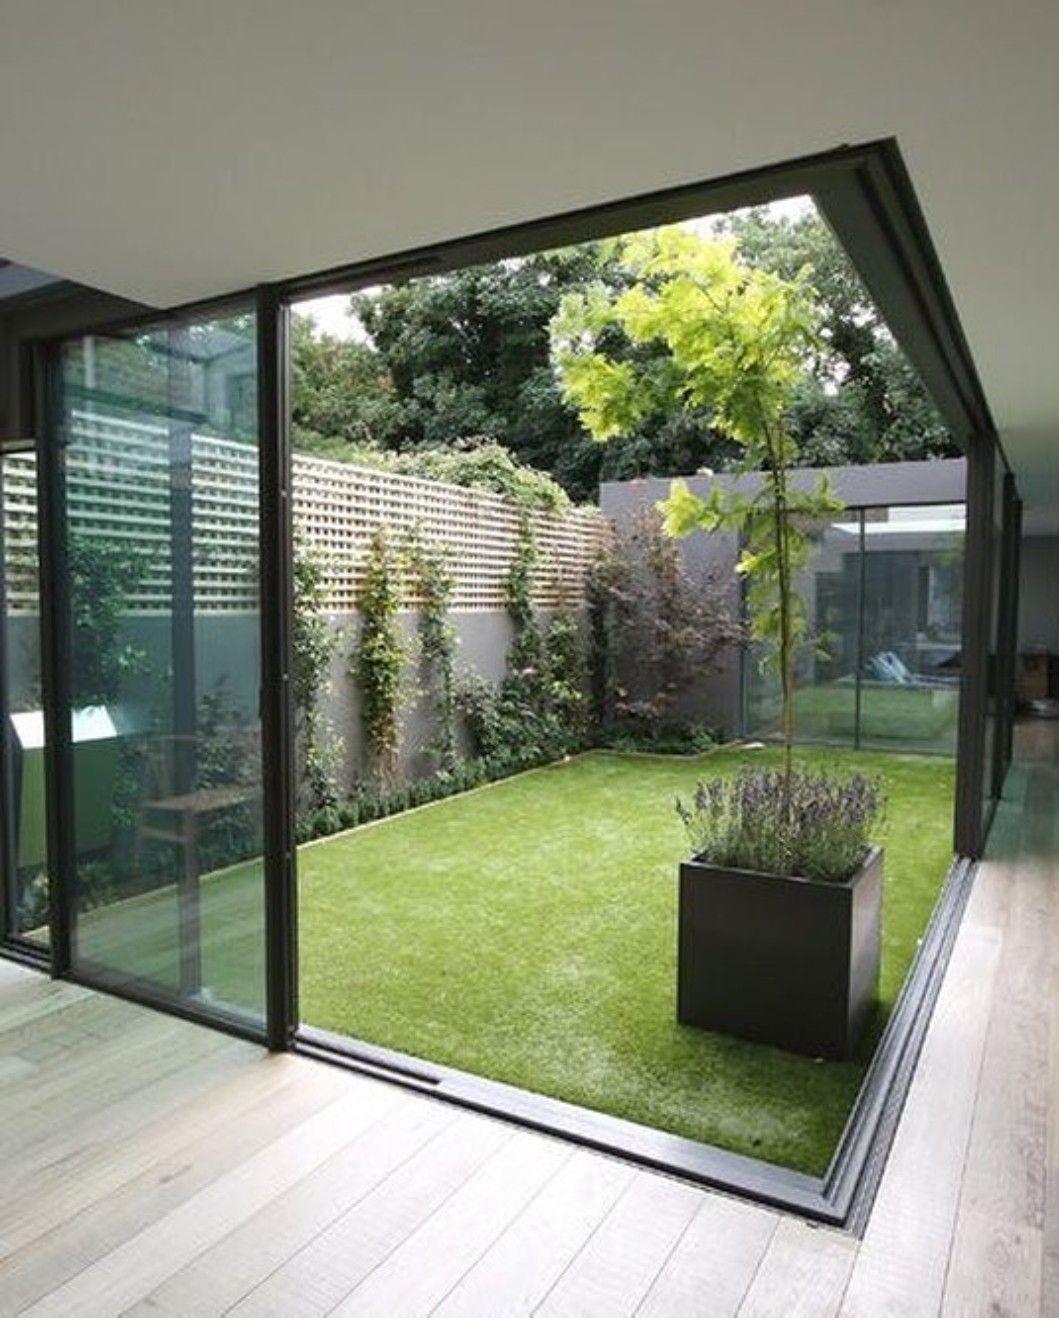 Decoration Exterieur Jardin Moderne Élégant Images Idealny Na Okno Od Strony Sasiada Intérieur Pinterest